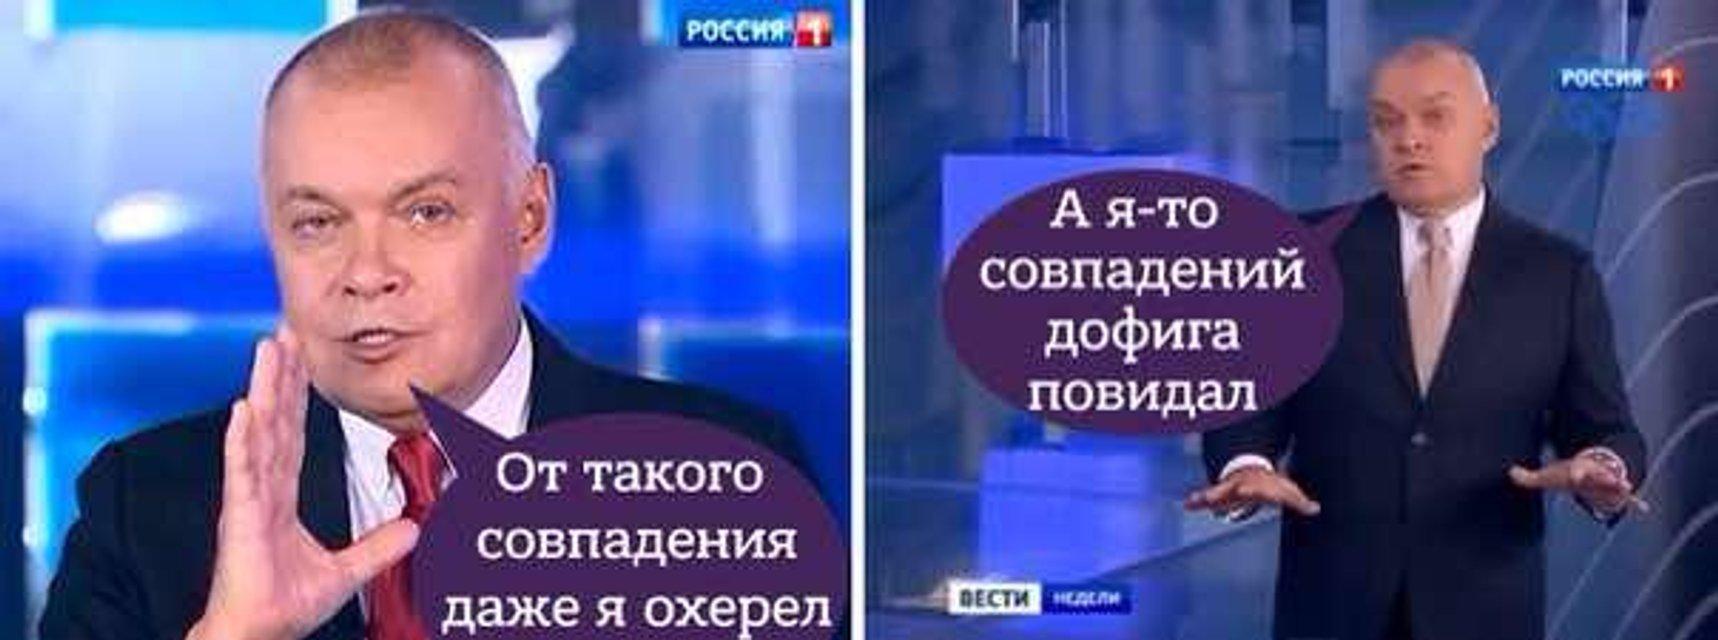 Гиви и Захарченко проголосуют на выборах: фотофакт - фото 177560